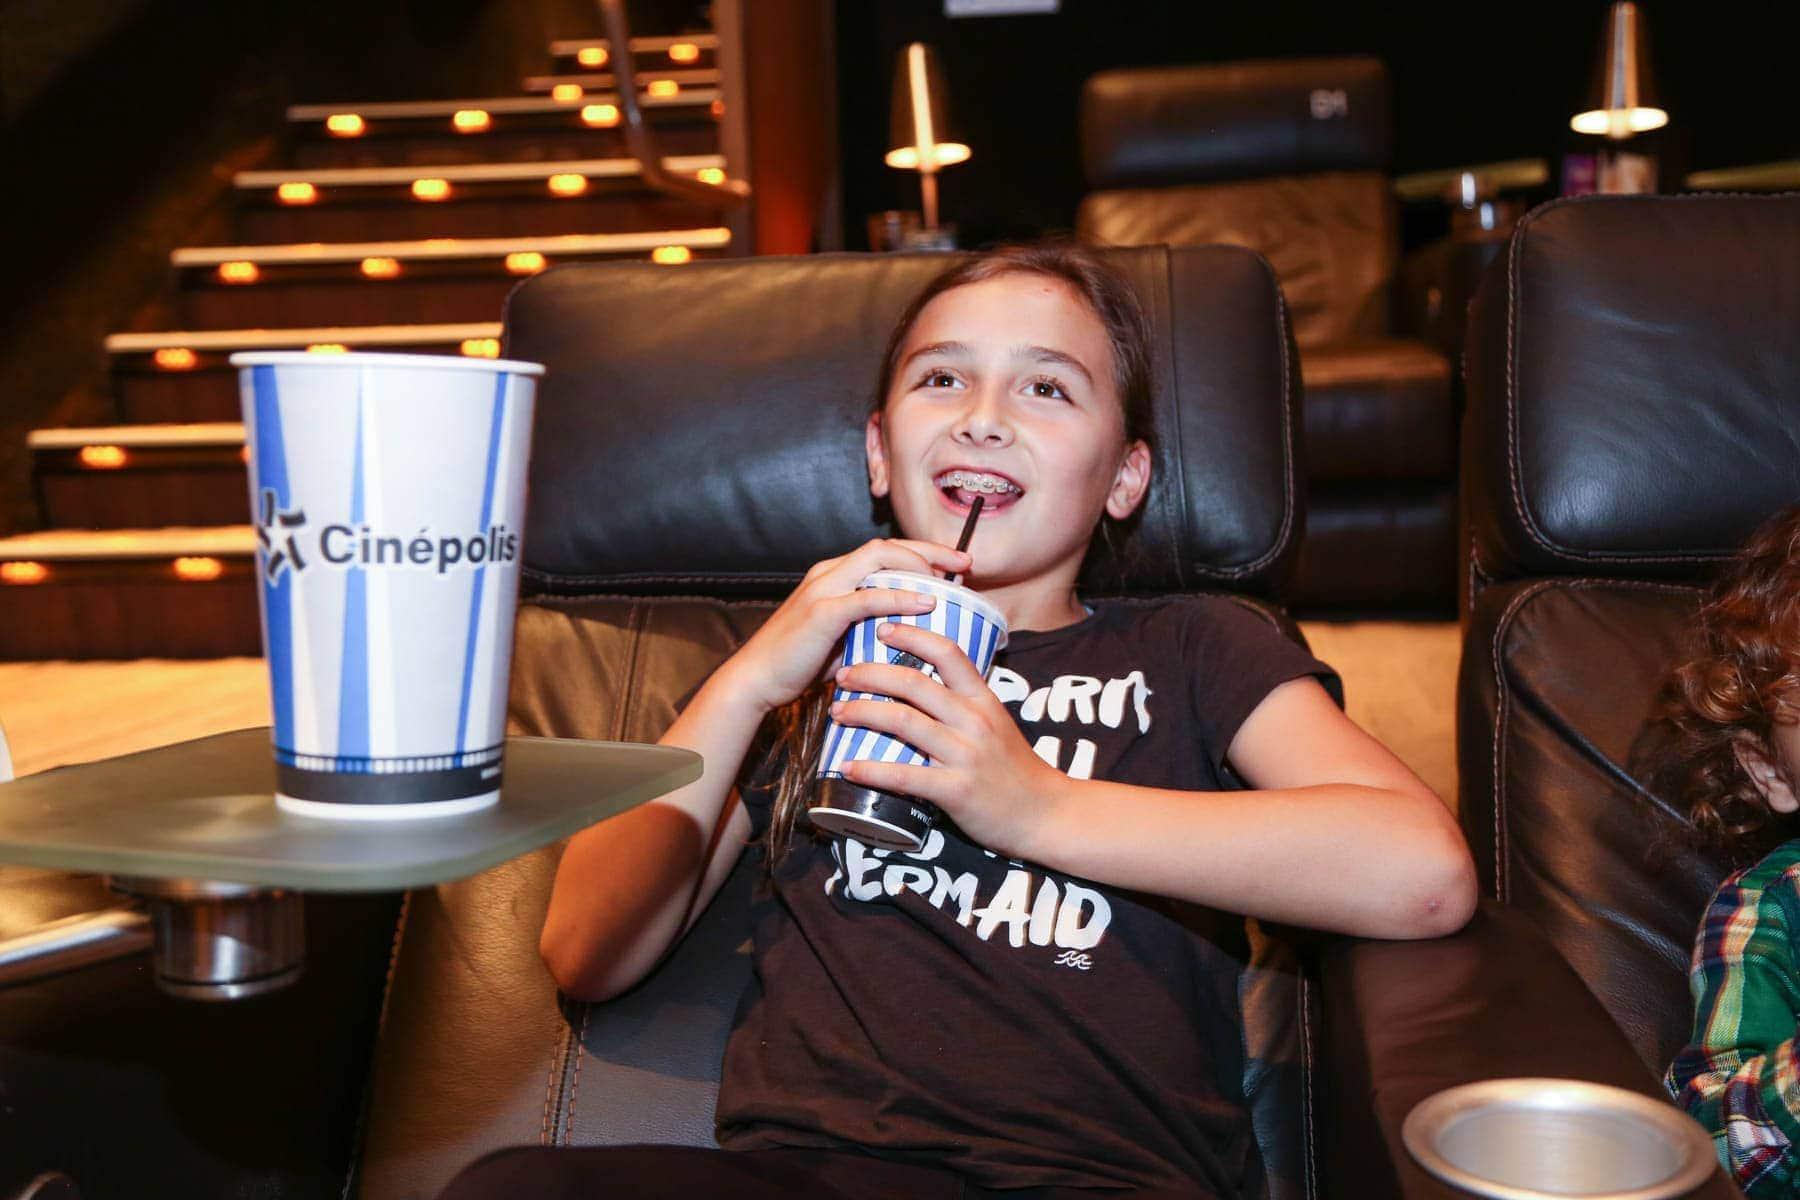 Happy Kid Watching a Movie #movienight #cinepolis #familybonding #familylove